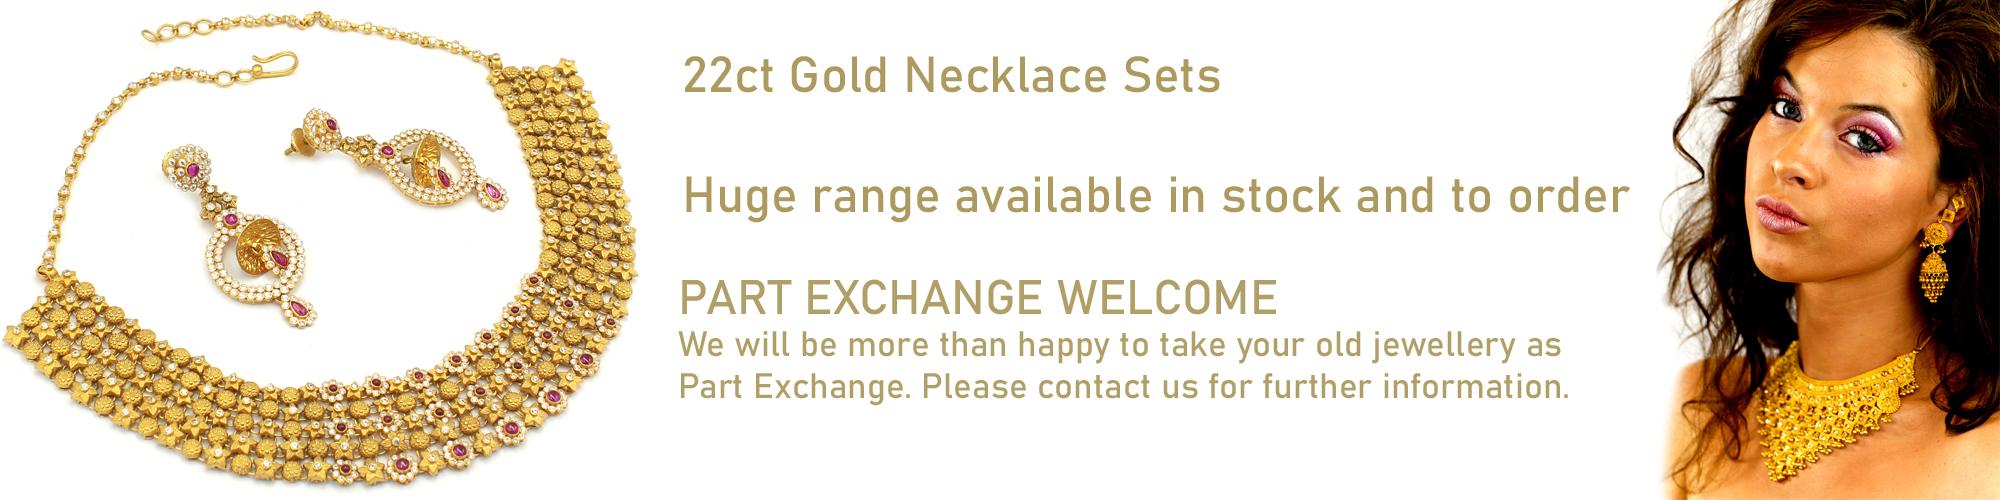 22ct_Gold_Sets